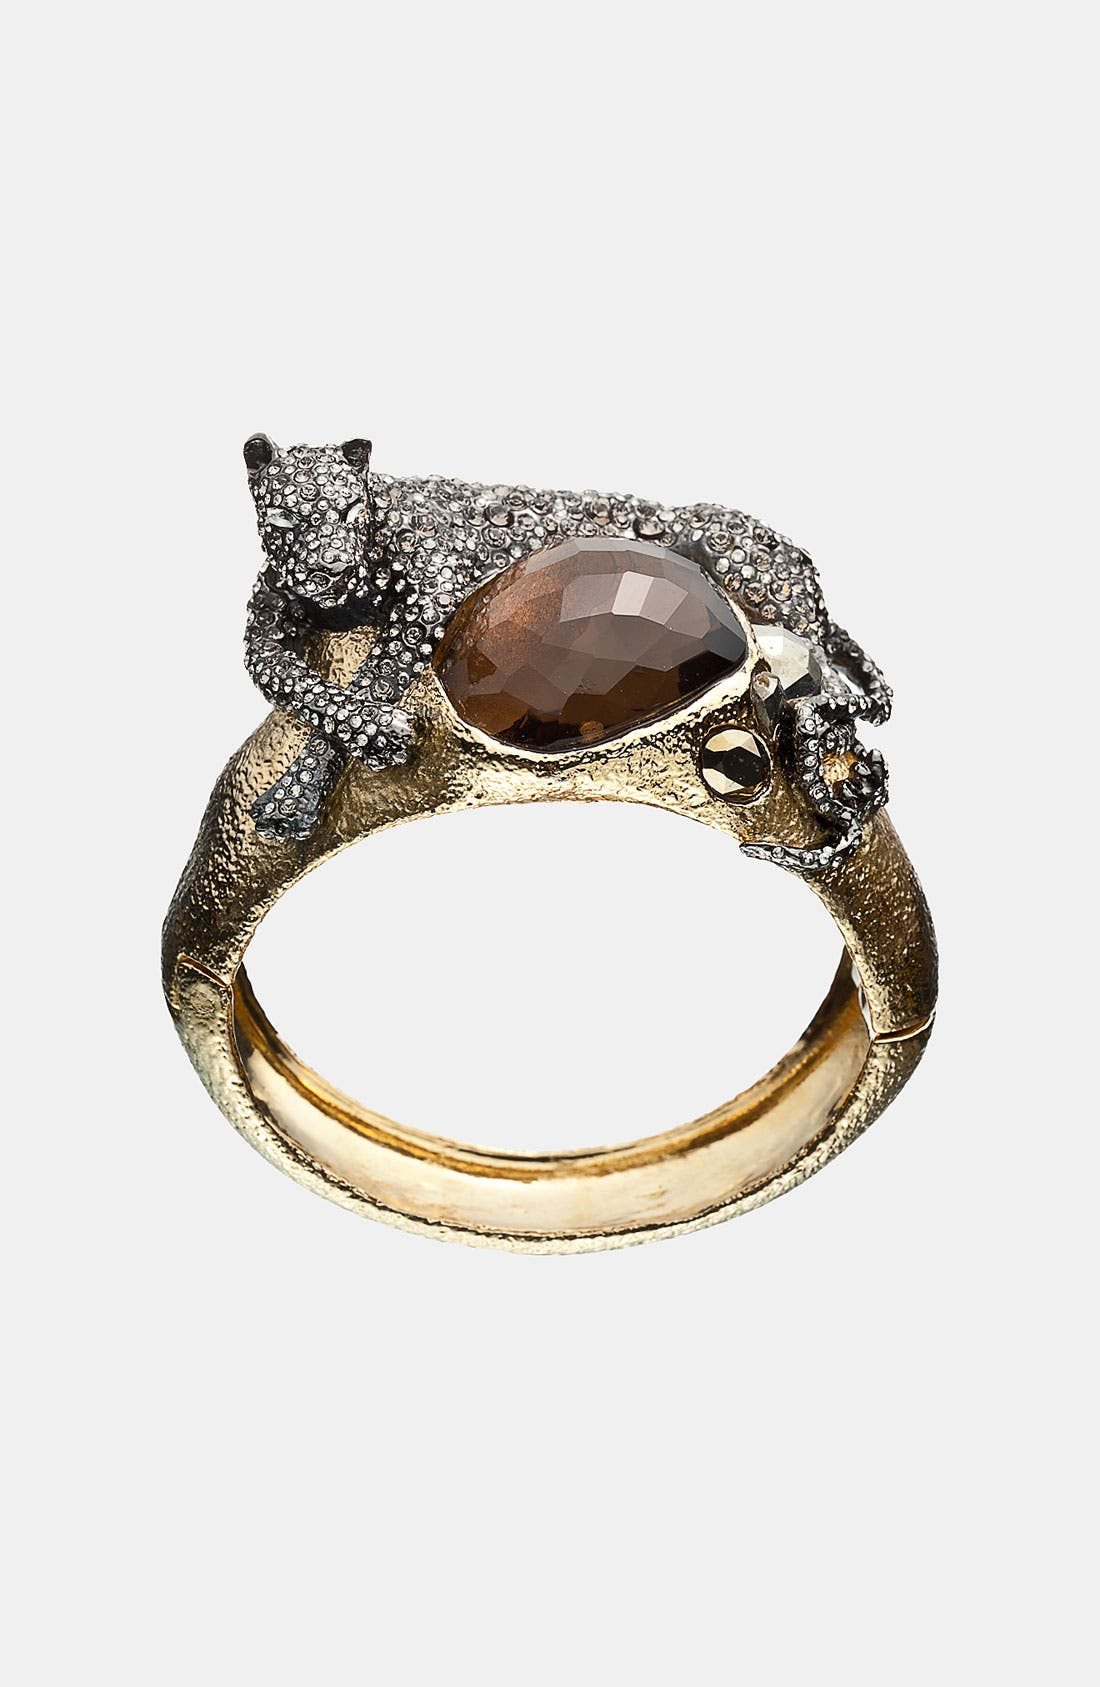 Alternate Image 1 Selected - Alexis Bittar 'Elements - Siyabona' Large Panther Hinged Bracelet